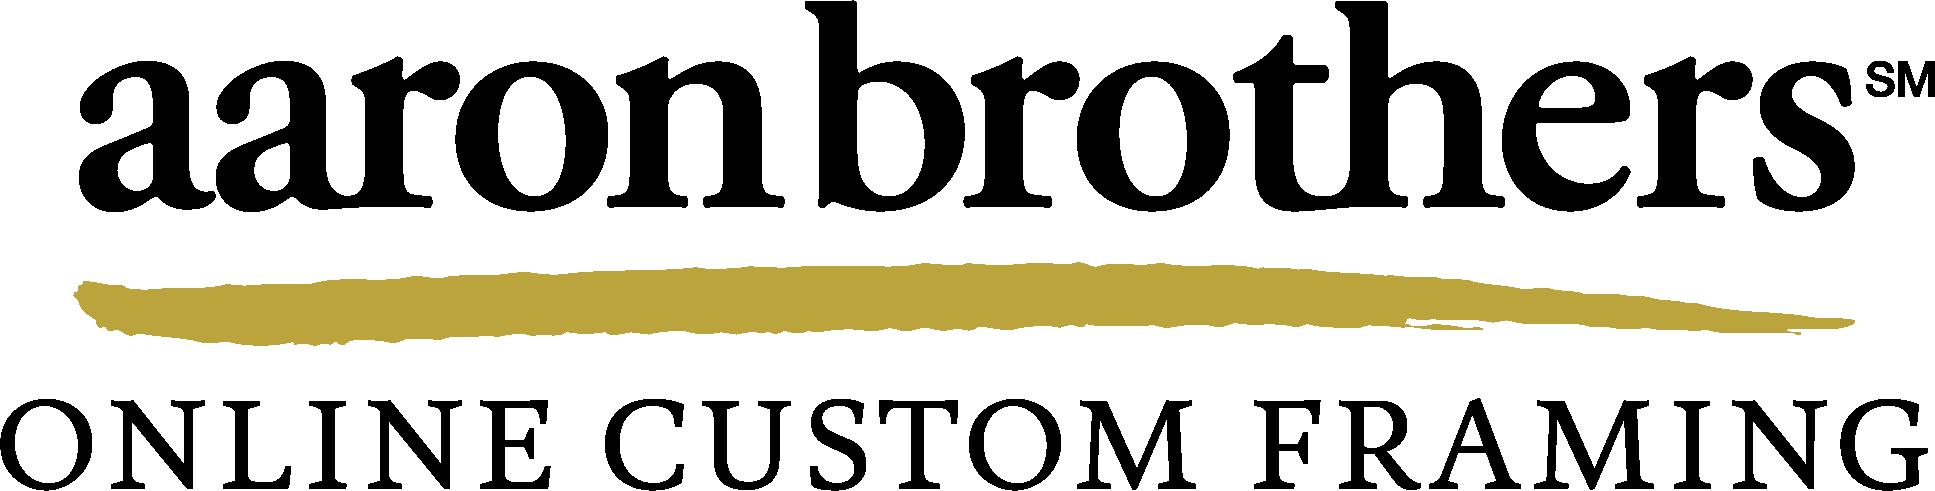 Aaron Brothers-Custom Frame